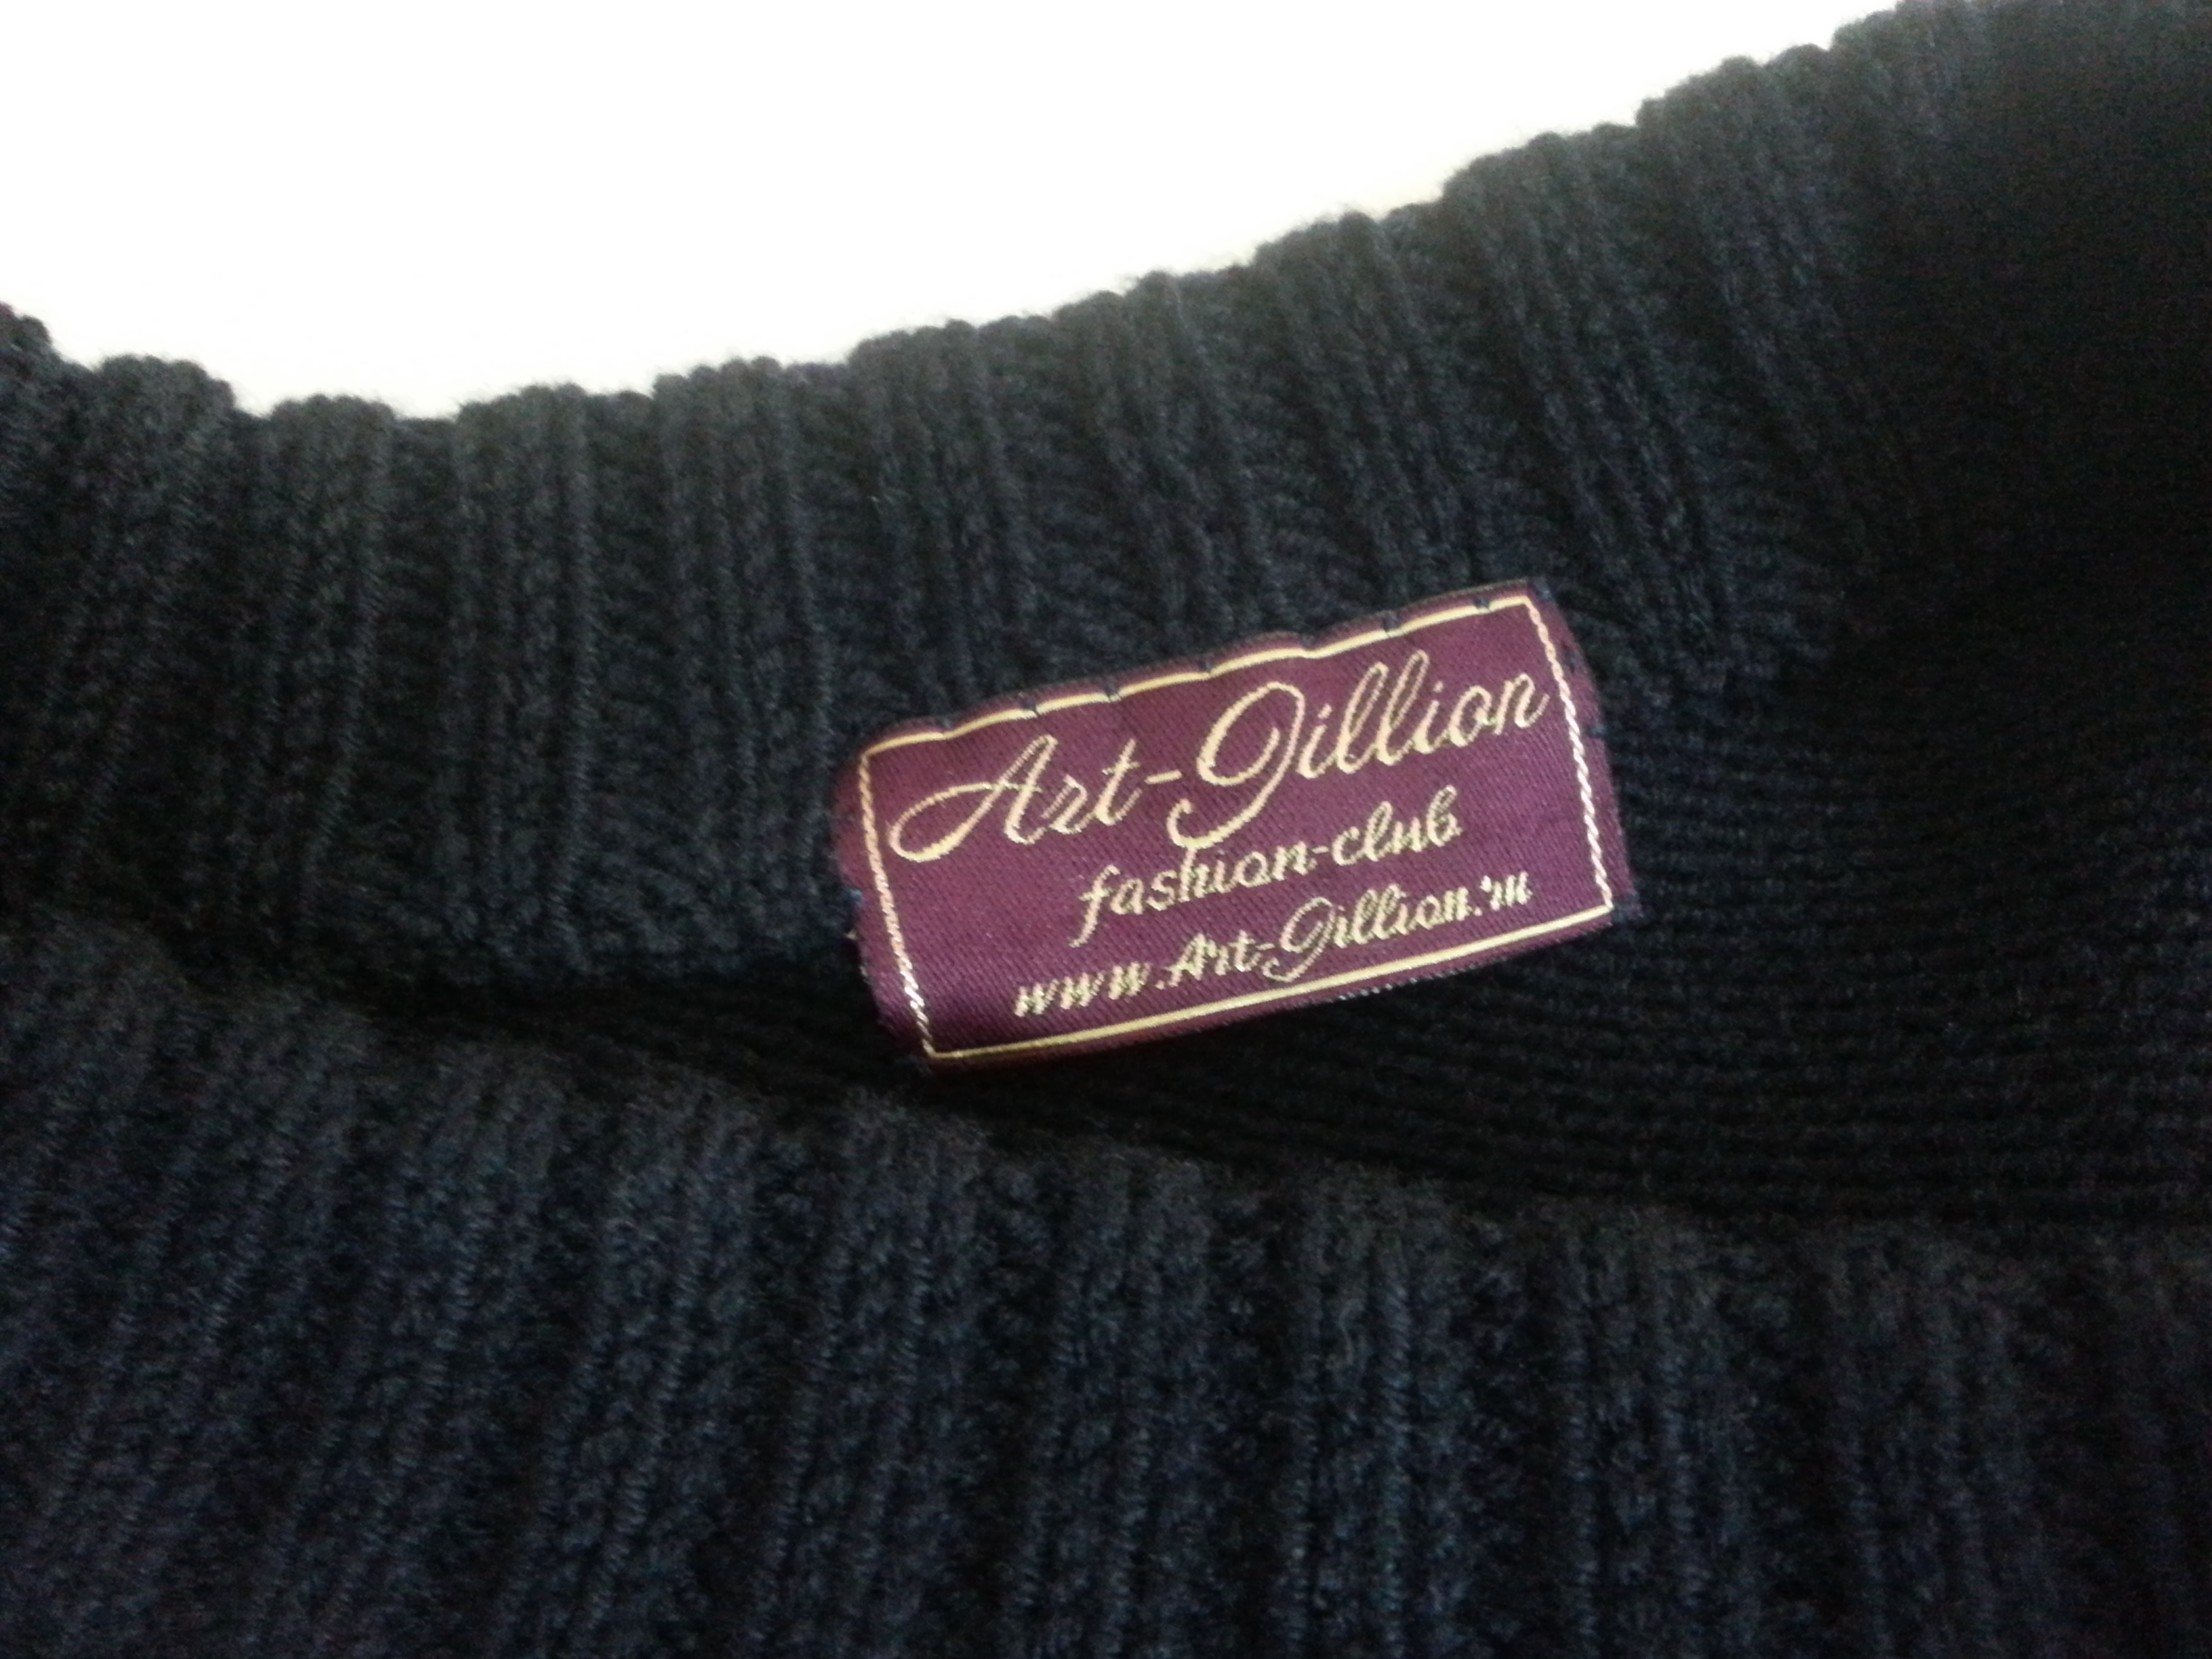 Art-Jillion fashion-club